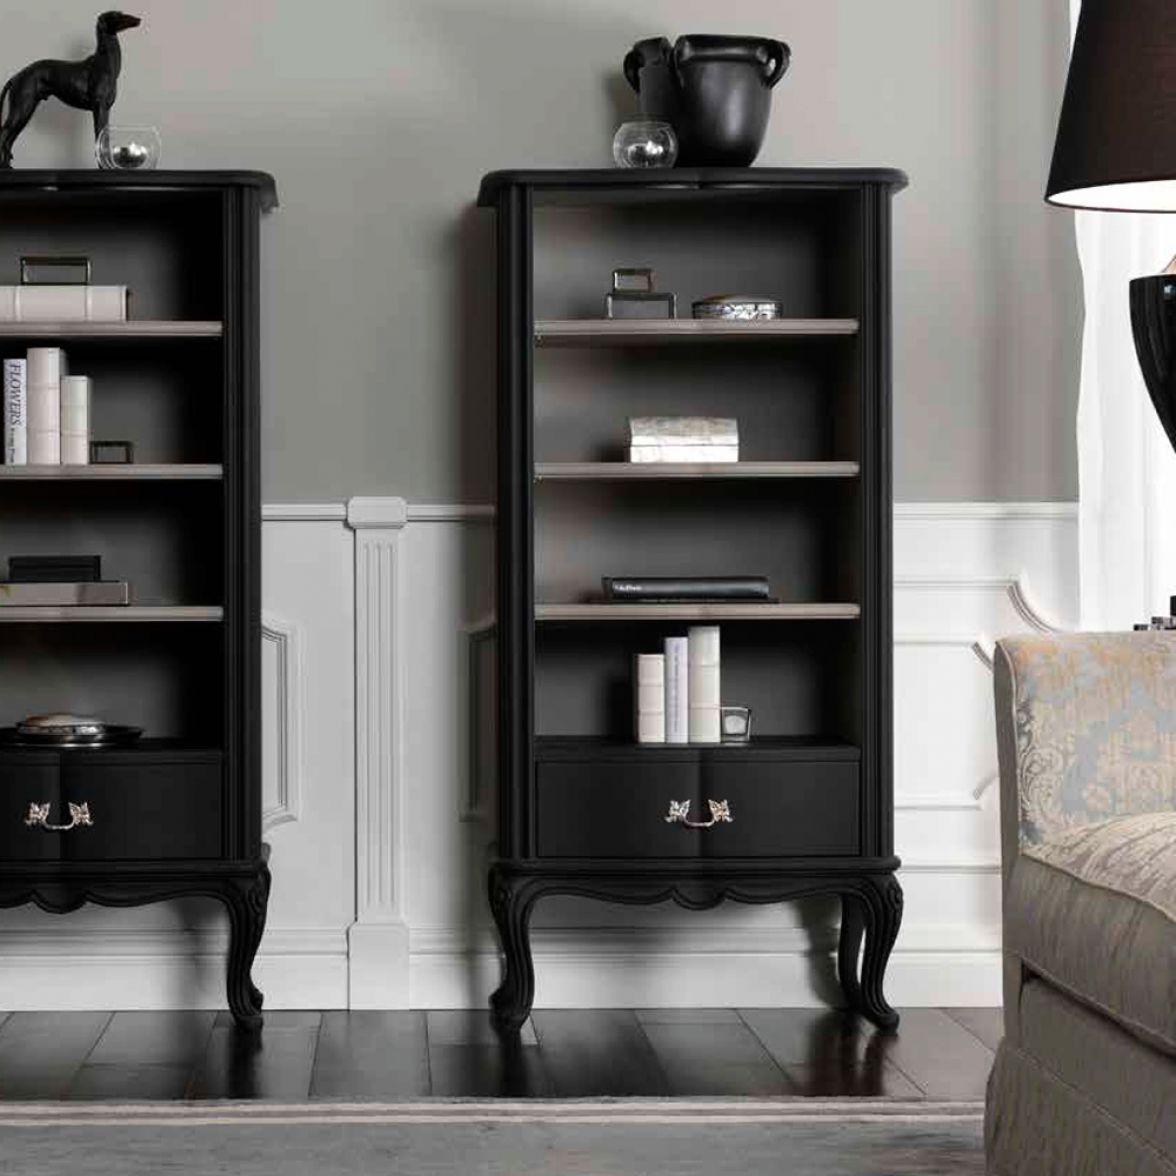 Canova small bookcase фото цена